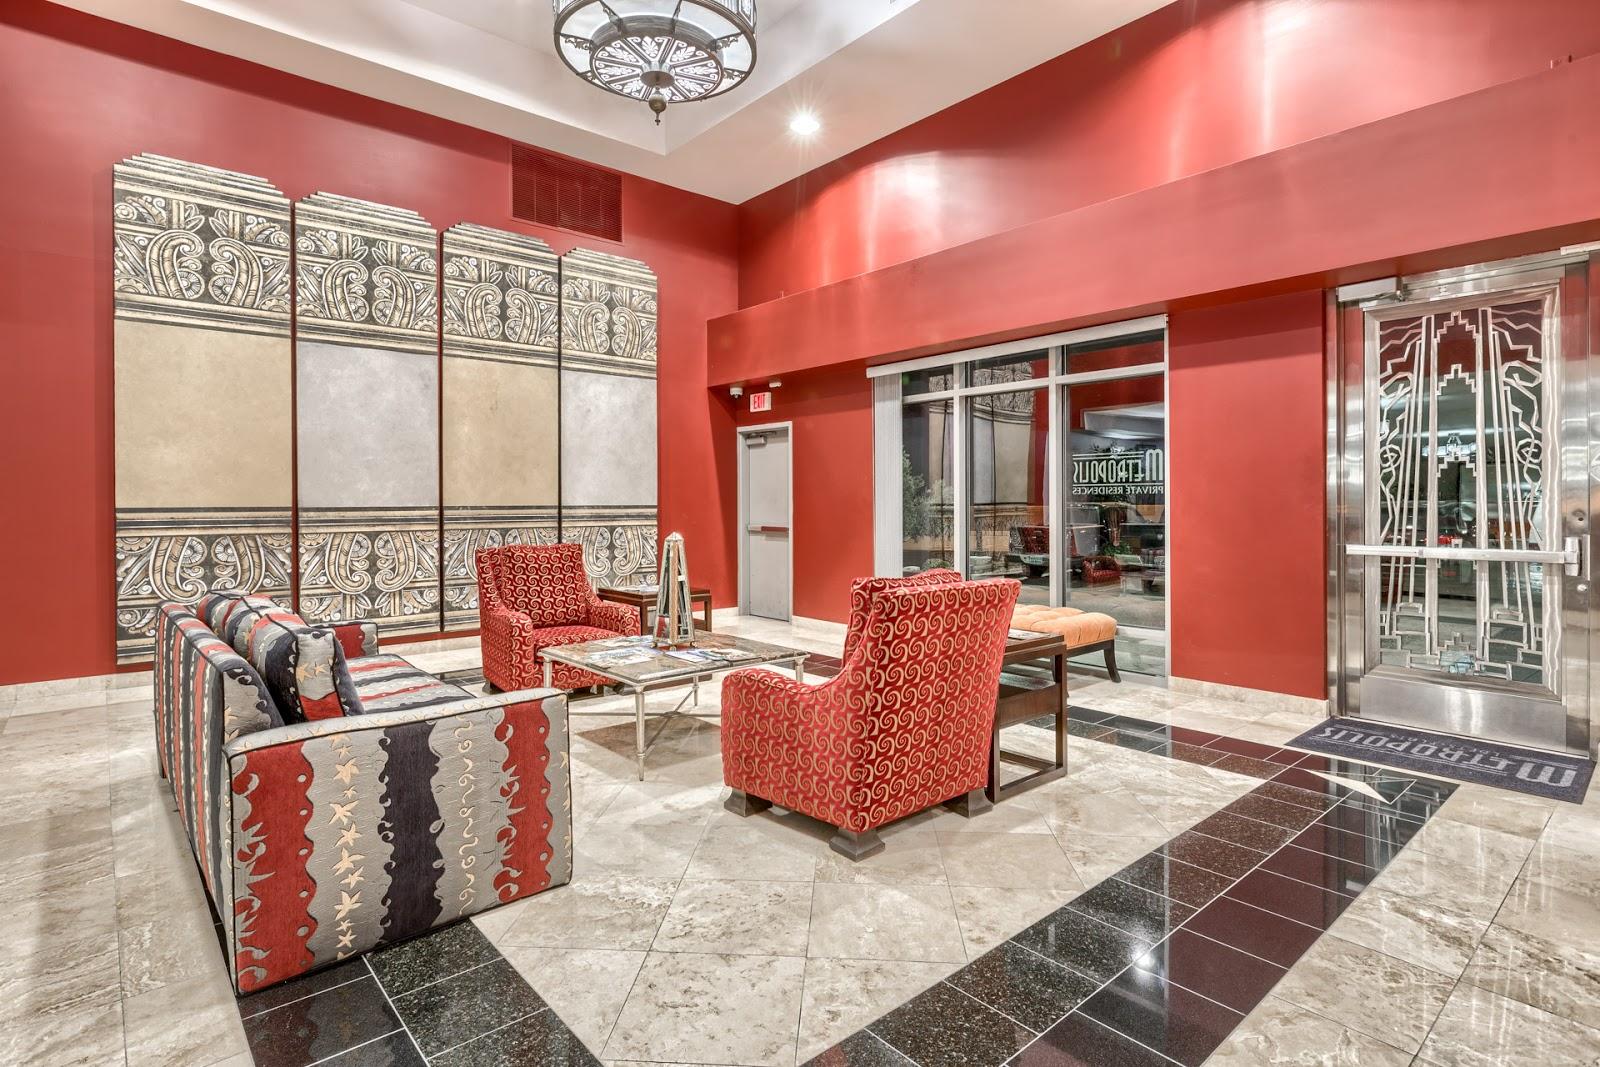 Las Vegas Condos Strip High Rises Las Vegas Luxury Real Estate News Beautiful Strip Golf